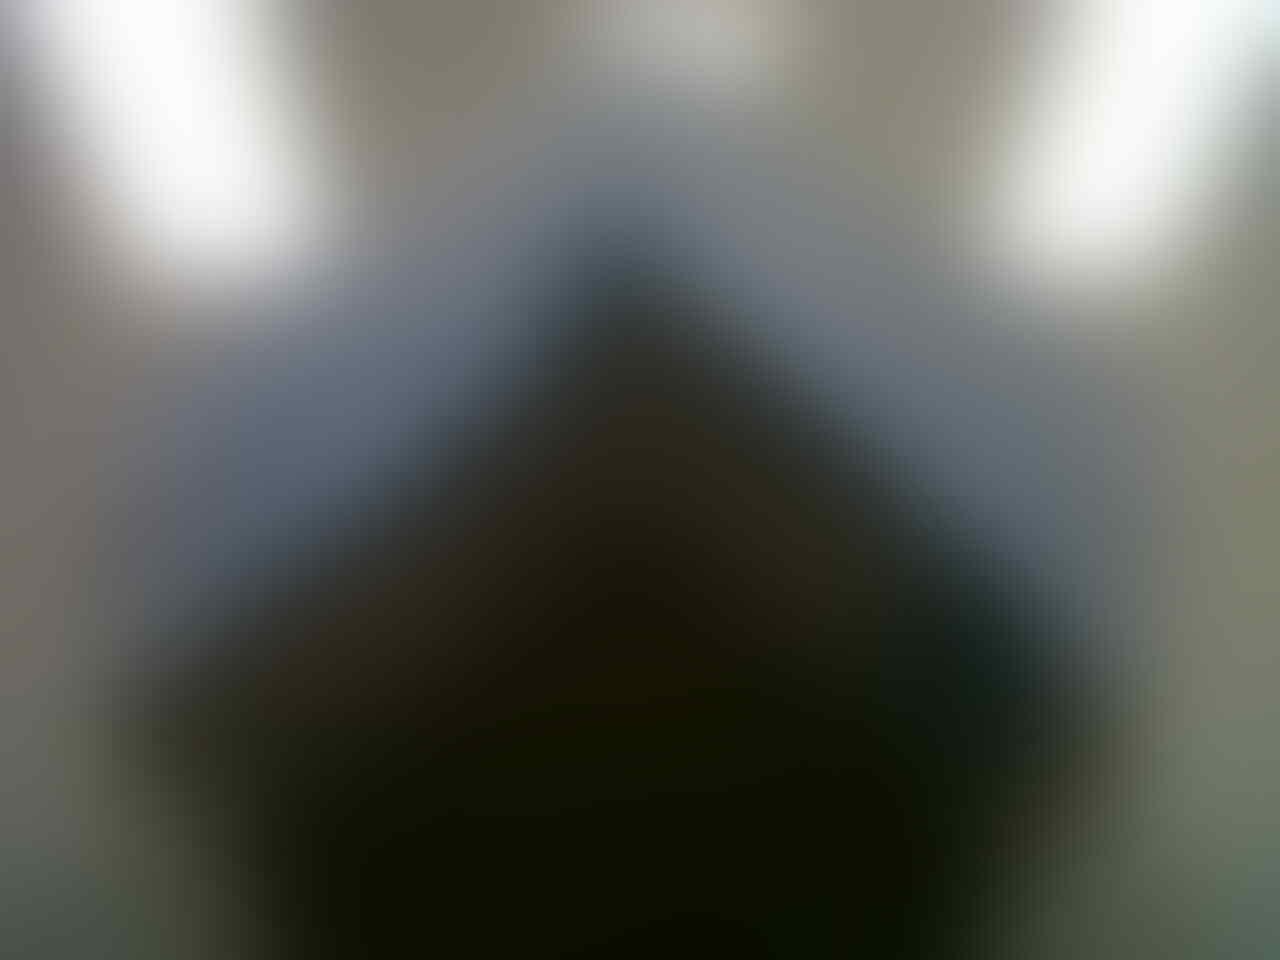 Puma Powercat 3.12 Gravity IT | Size 42 | BNIB | Harga Obral | Rare Item